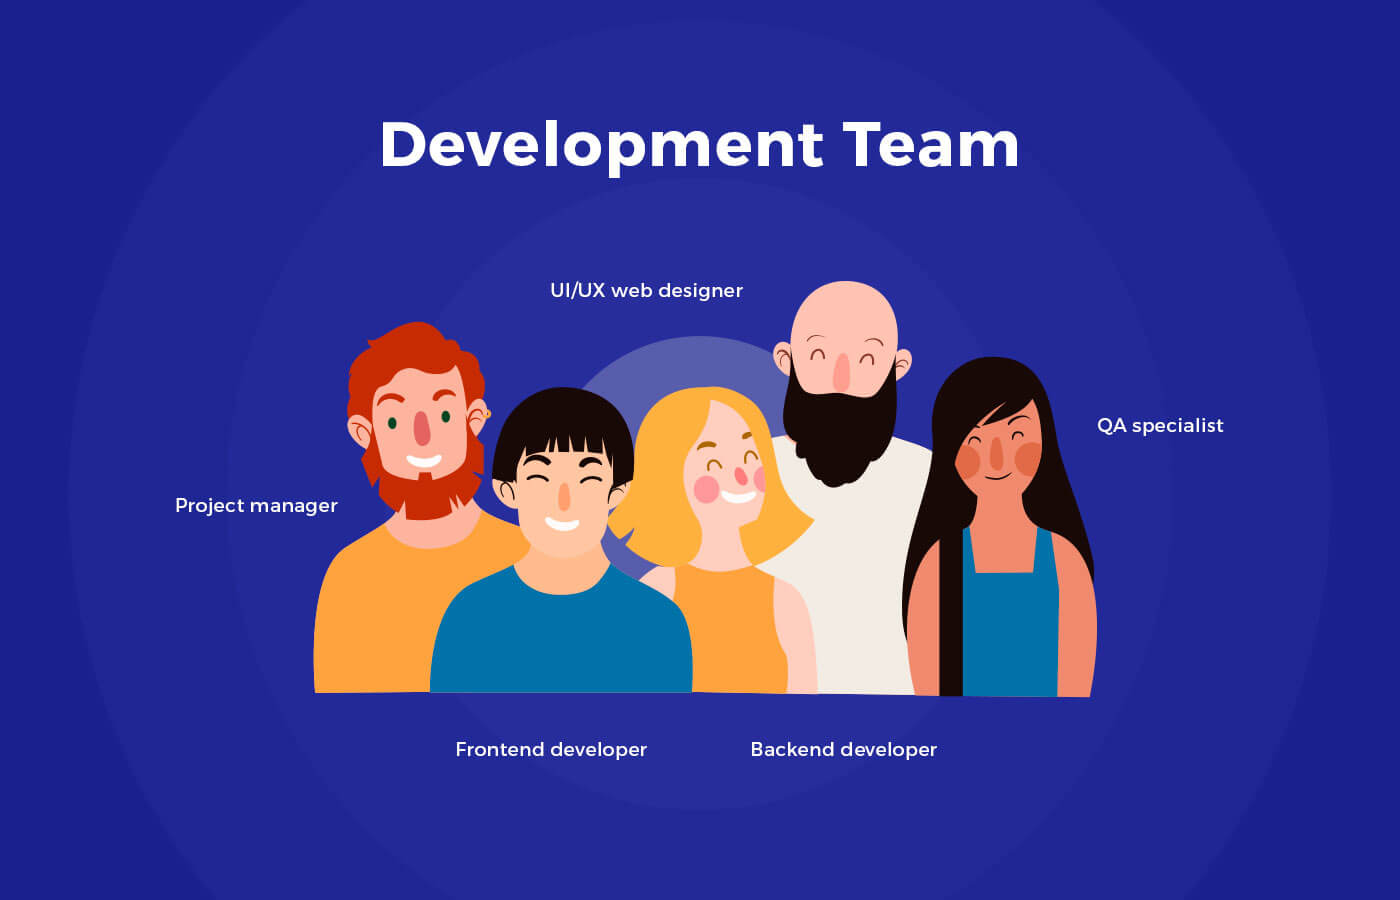 Development team for marketplace website development